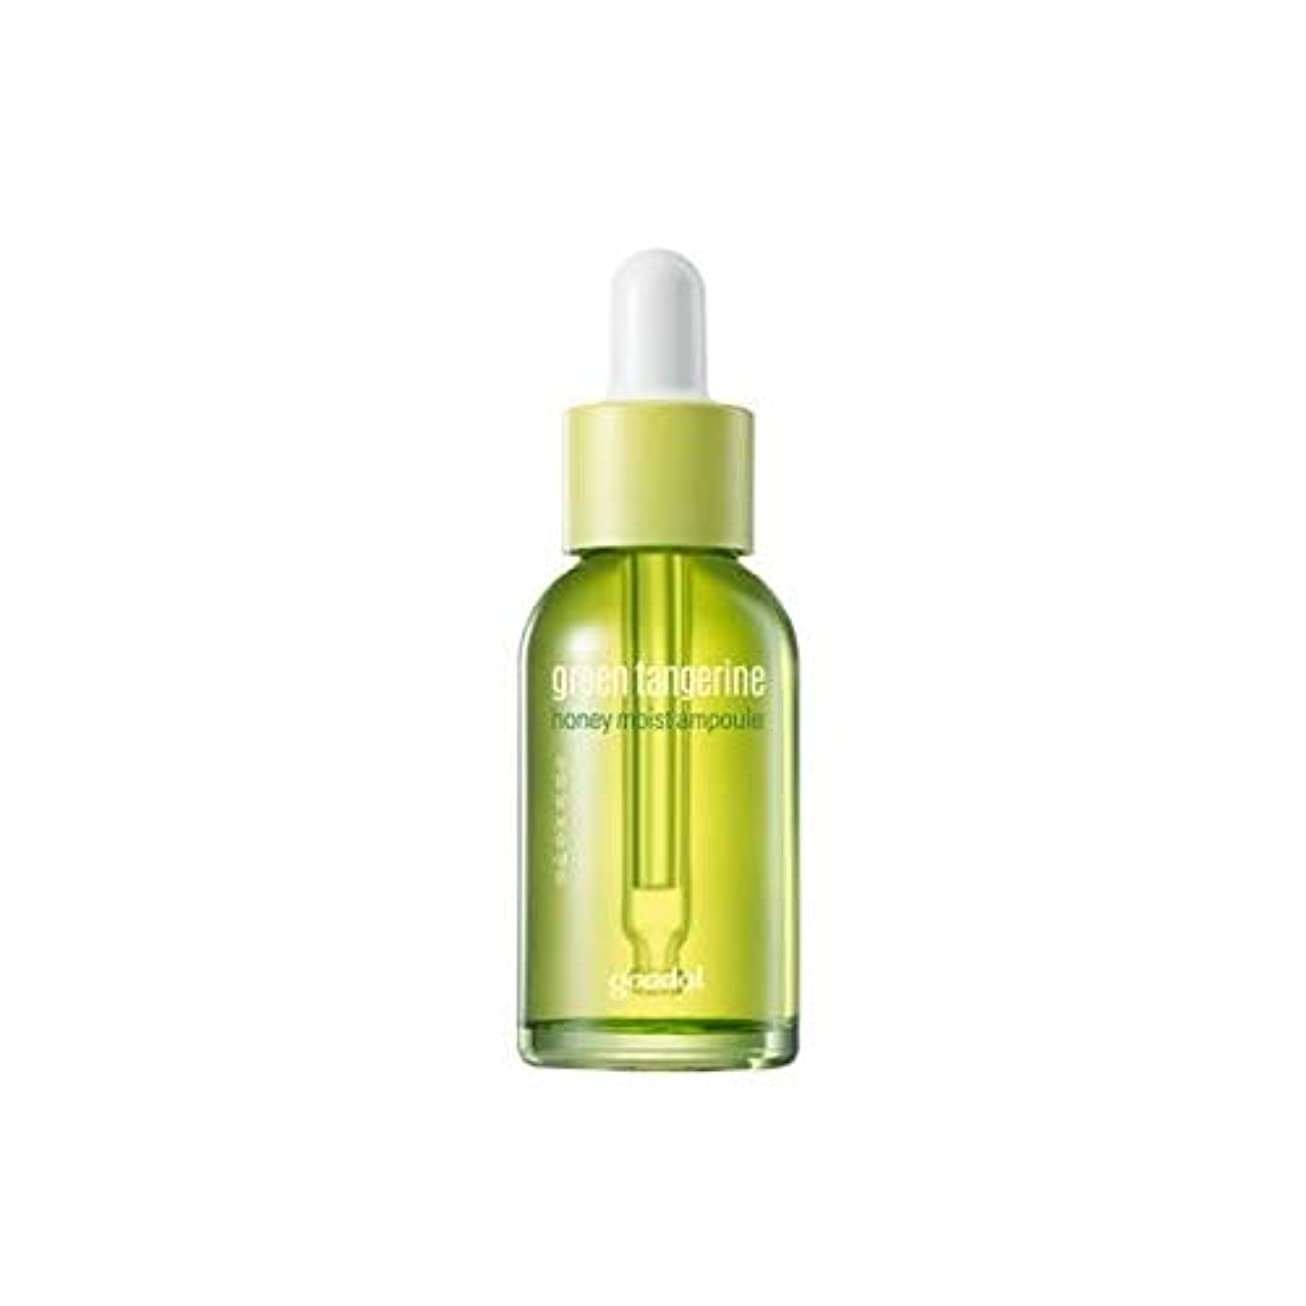 Goodal Green Tangerine Honey Moist Ampule グーダル チョンギュル(青みかん) ハニー モイスト アンプル 30ml [並行輸入品]